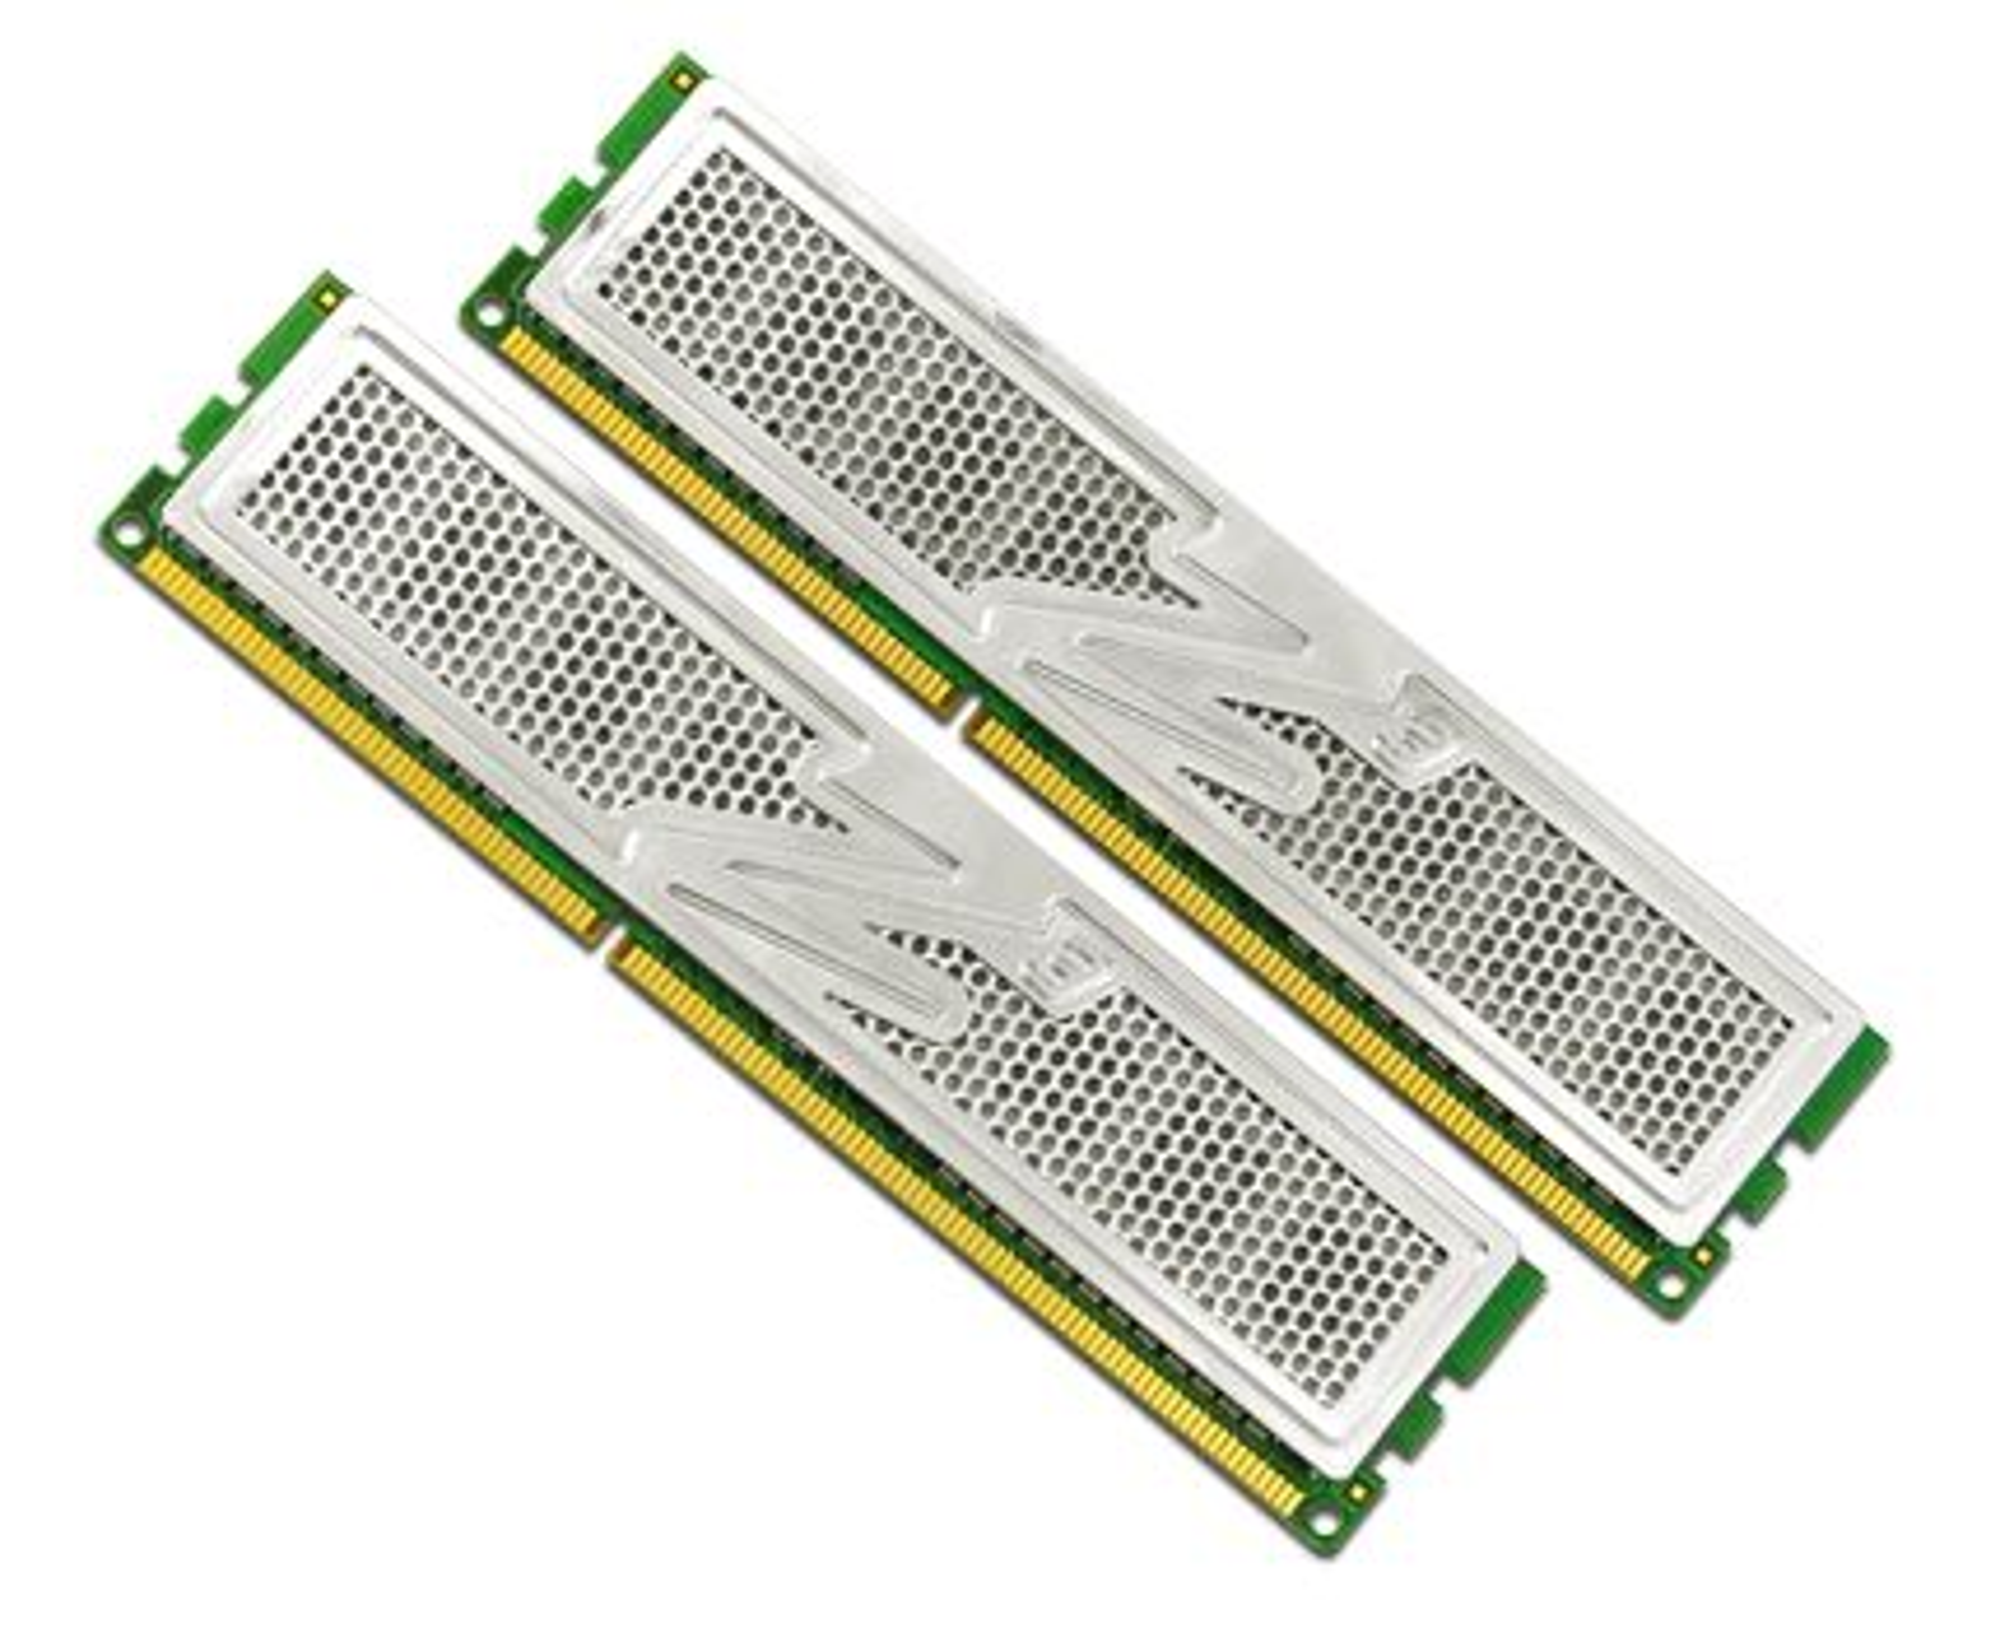 OCZ DDR3 PC3-14400 Platinum Edition